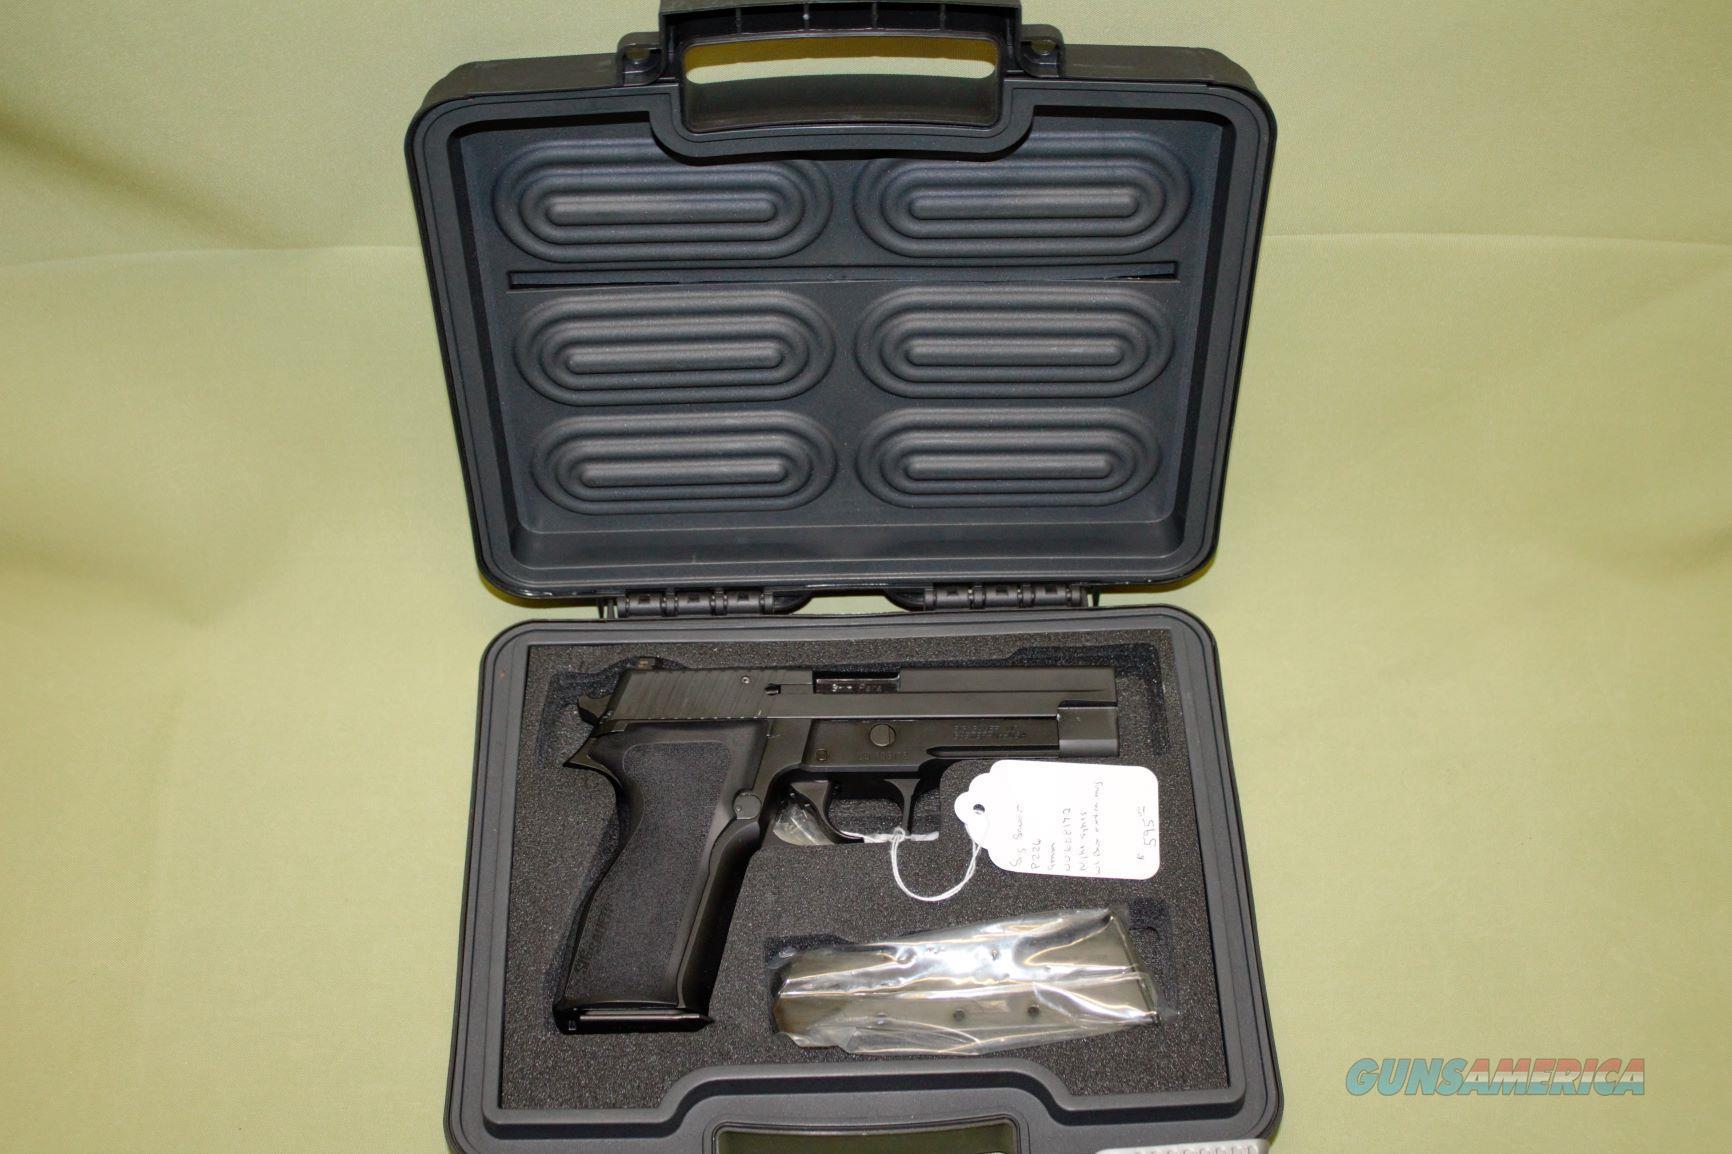 Sig Sauer P226 9mm   Guns > Pistols > Sig - Sauer/Sigarms Pistols > P226